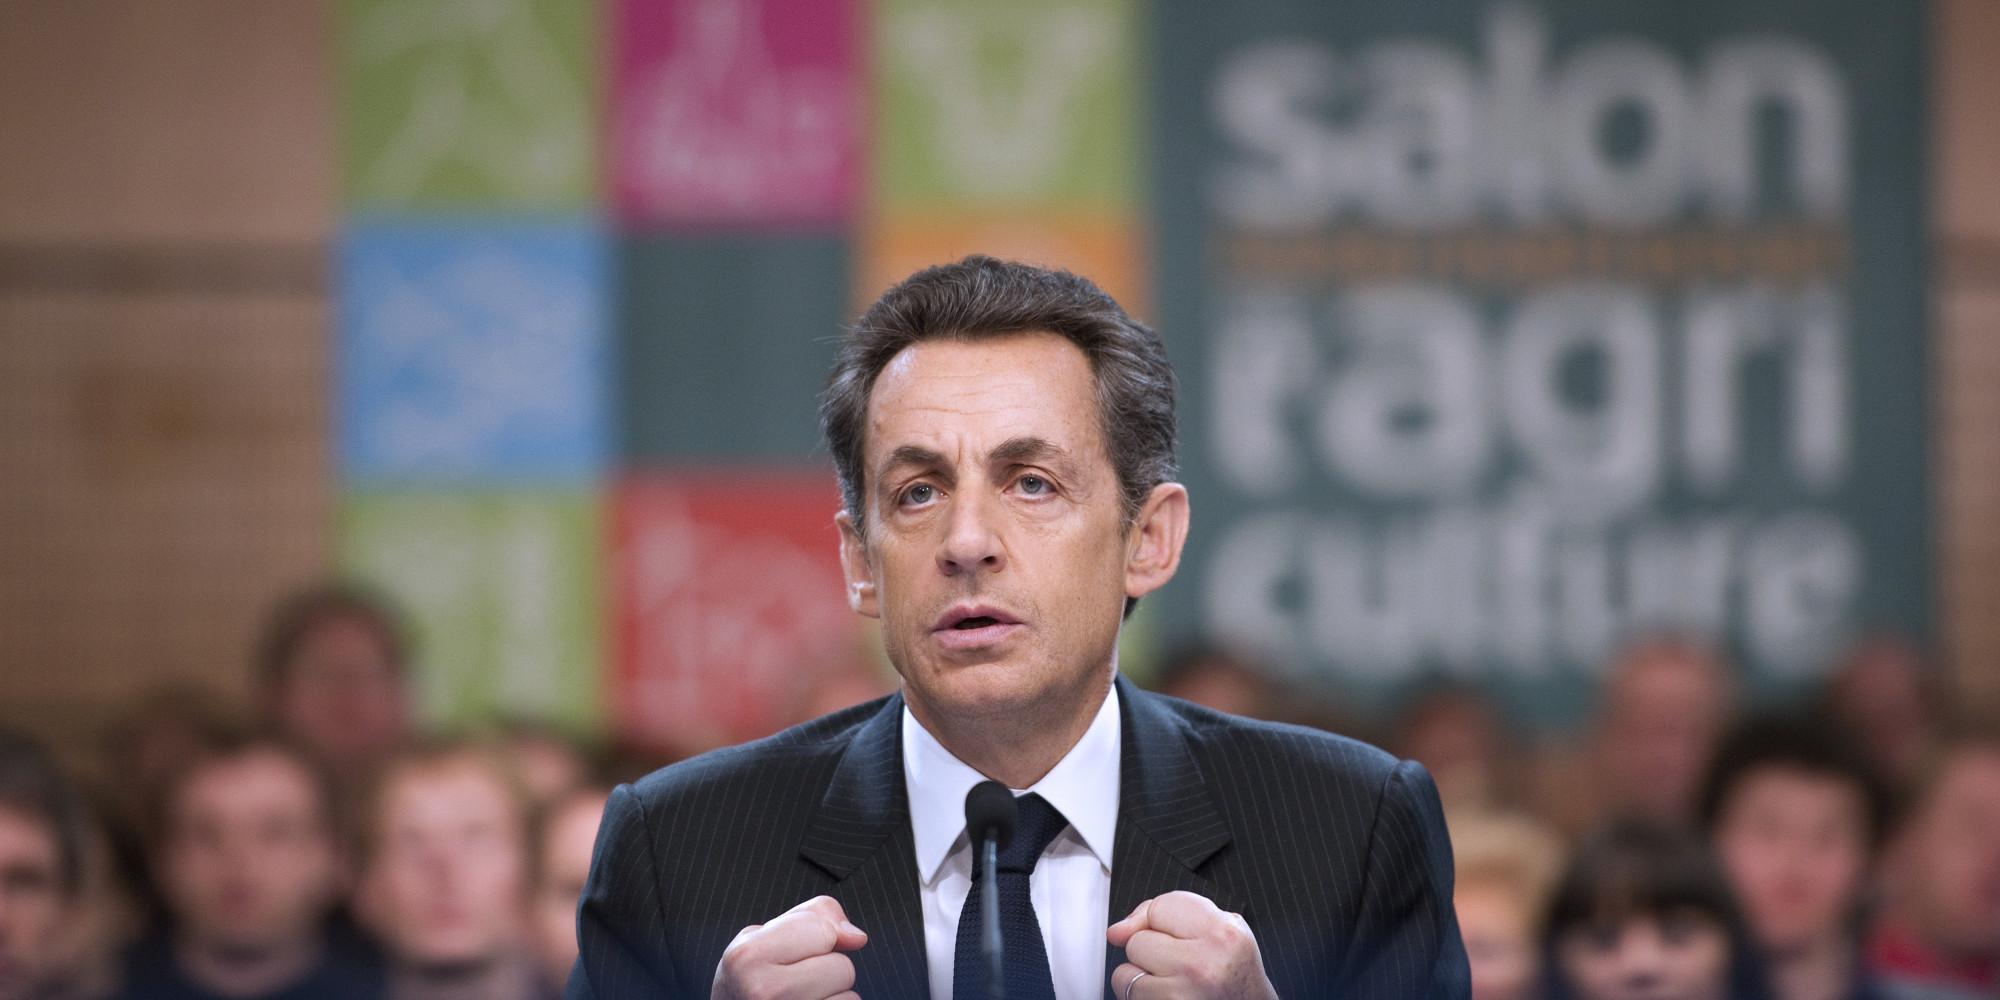 Salon de l 39 agriculture nicolas sarkozy veut choyer des for Sarkozy salon agriculture